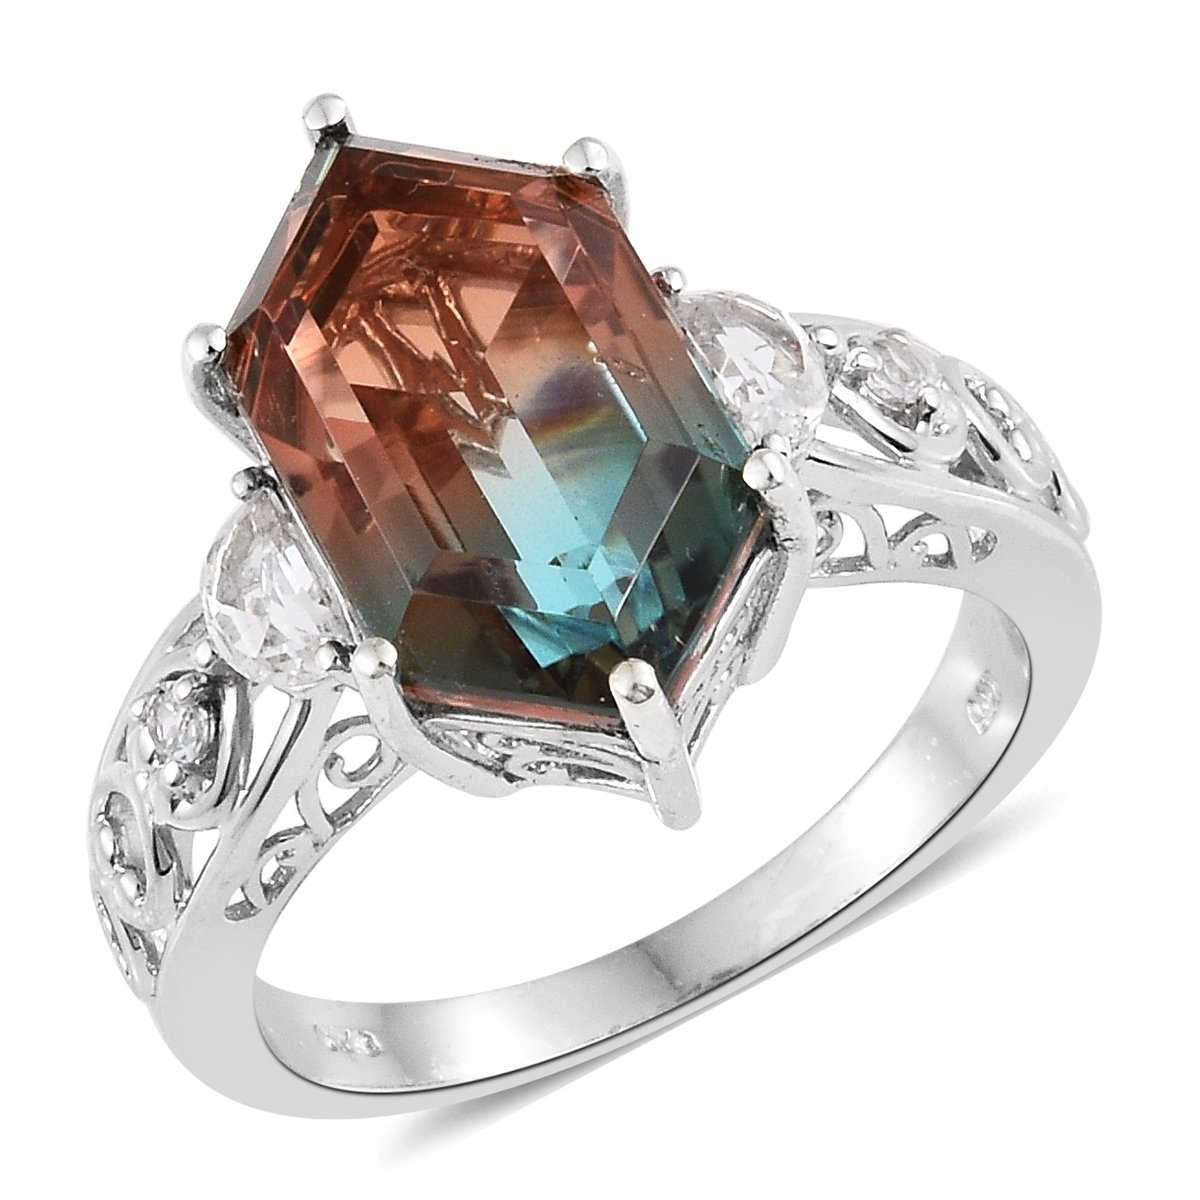 925 Sterling Silver Platinum Plated Fancy Aqua Terra Costa Quartz, White Topaz Gift Ring For Women Size 8